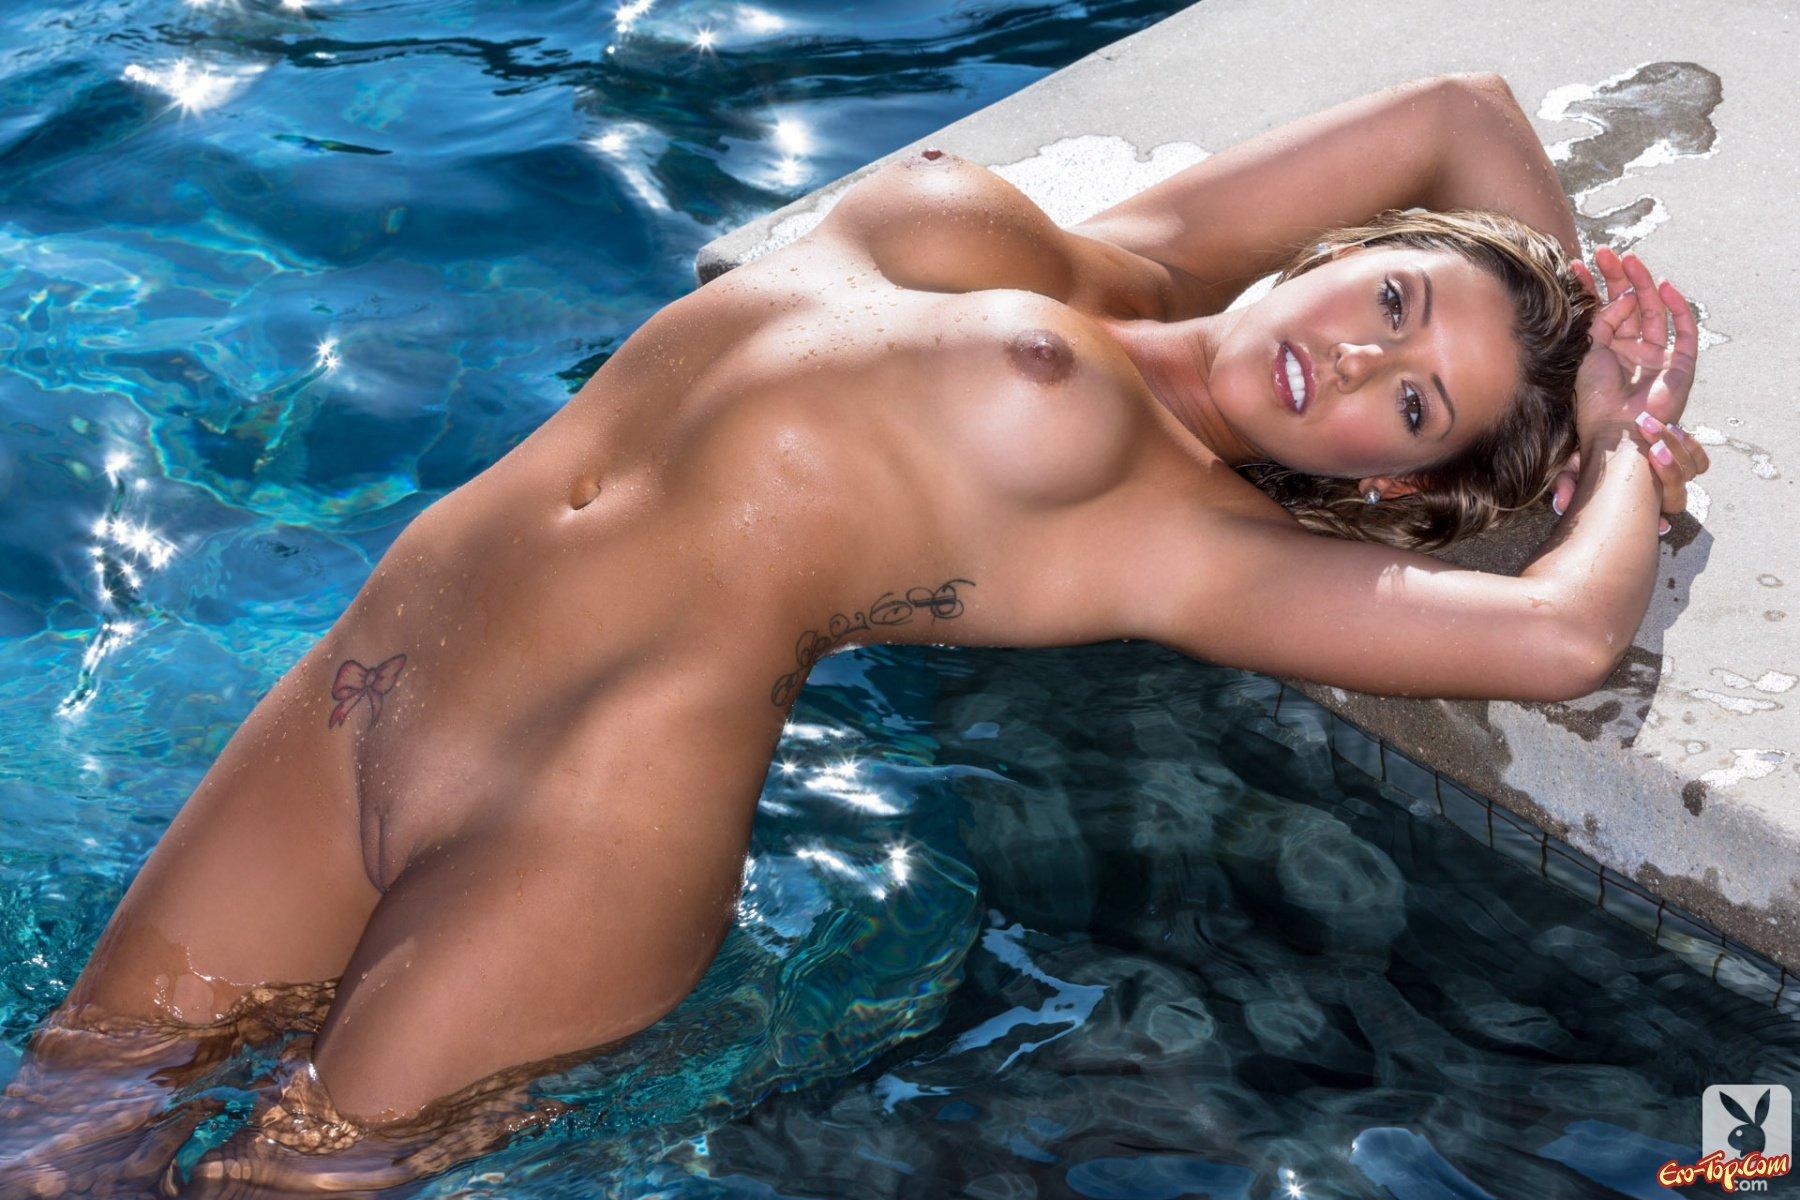 Woman в купальнике